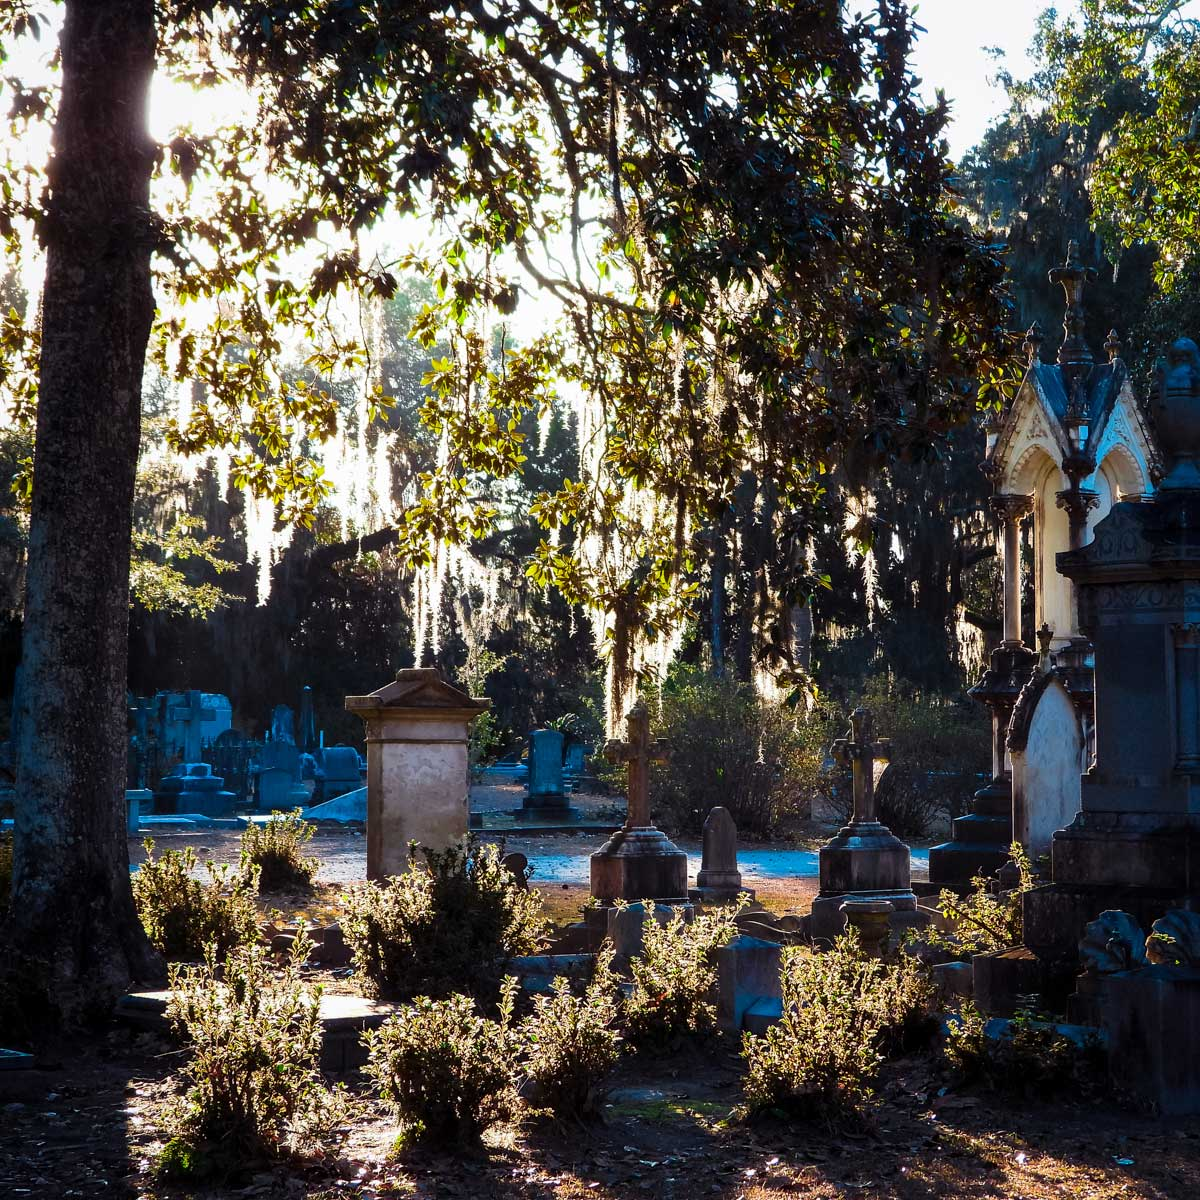 Bonaventure Cemetery in the morning